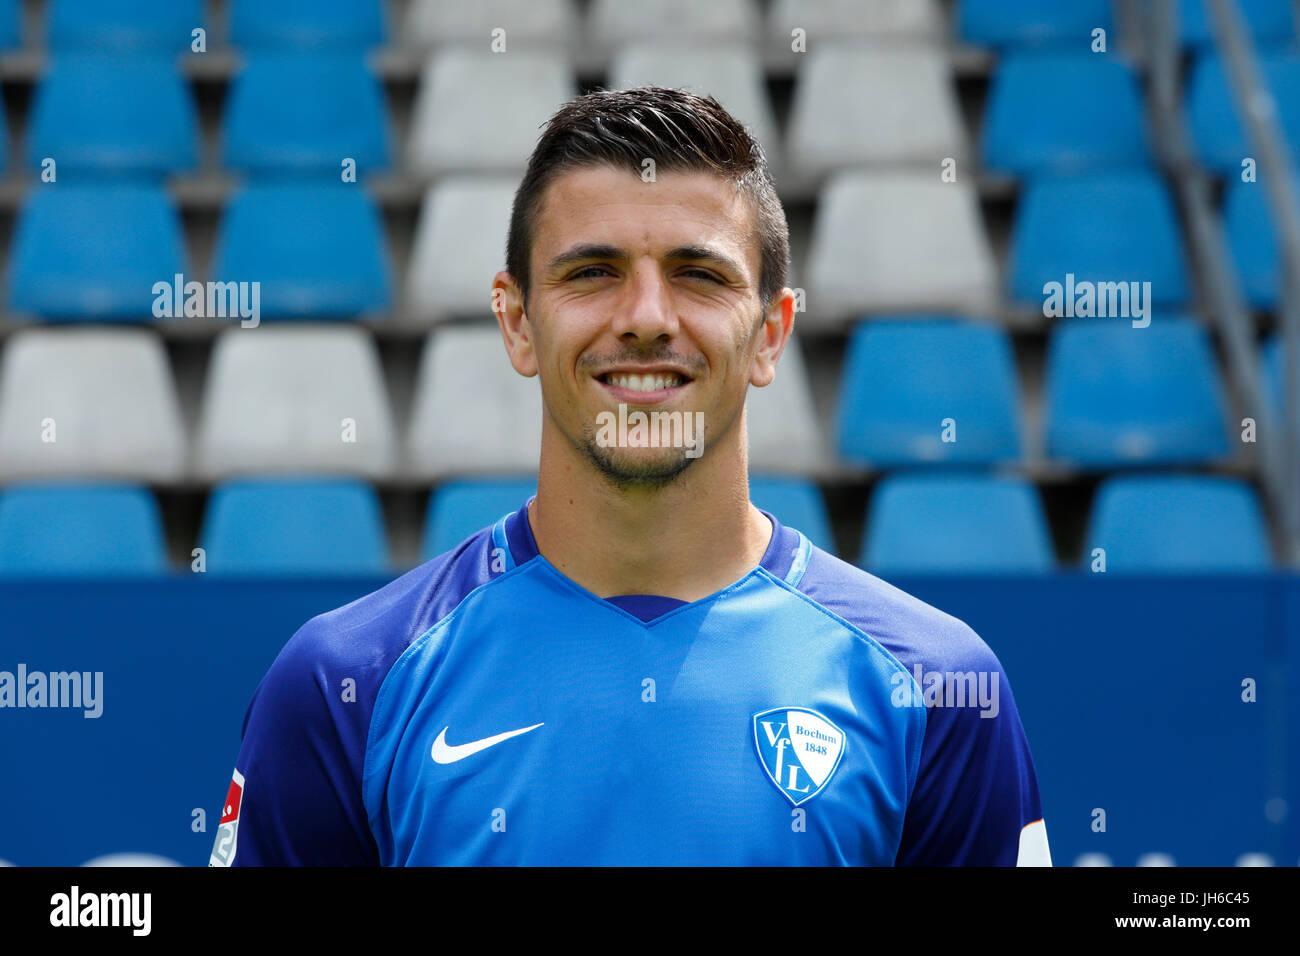 football, 2. Bundesliga, 2017/2018, VfL Bochum, team presentation for the game season, Anthony Losilla - Stock Image